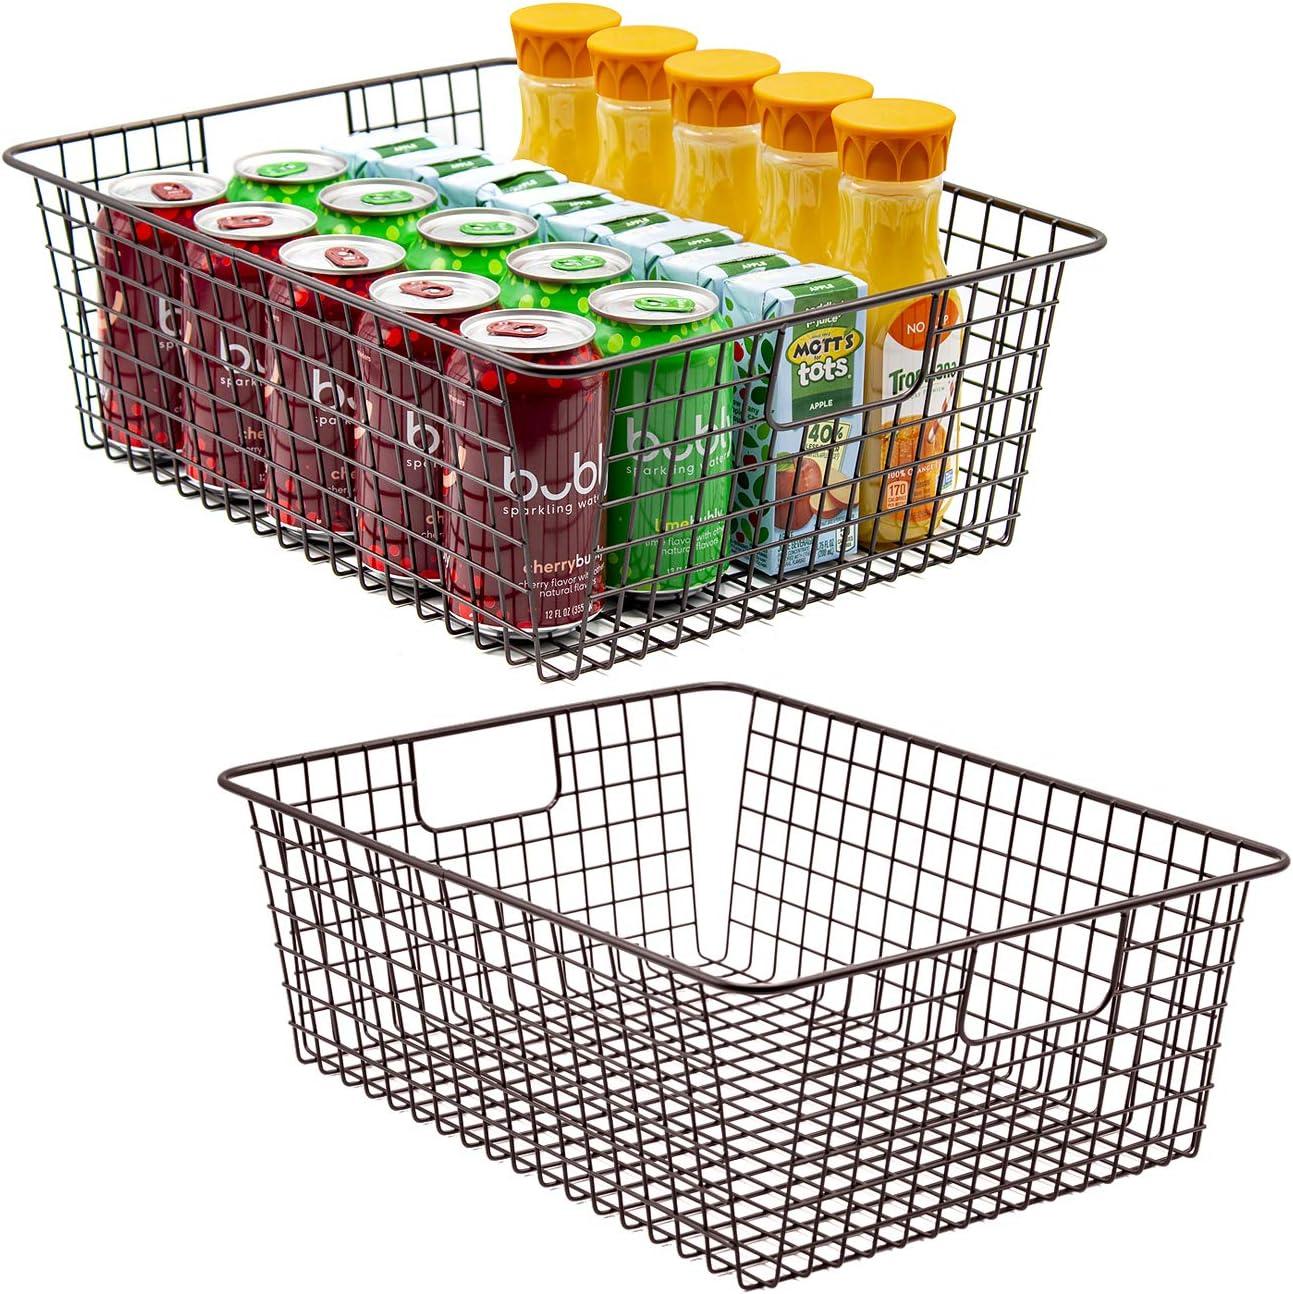 Sorbus Metal Wire Baskets Storage Bin Organizer for Food Pantry, Freezer, Kitchen, Laundry Room, Basket Organizers for Home, Bathroom, Closet Organization, Iron Metal